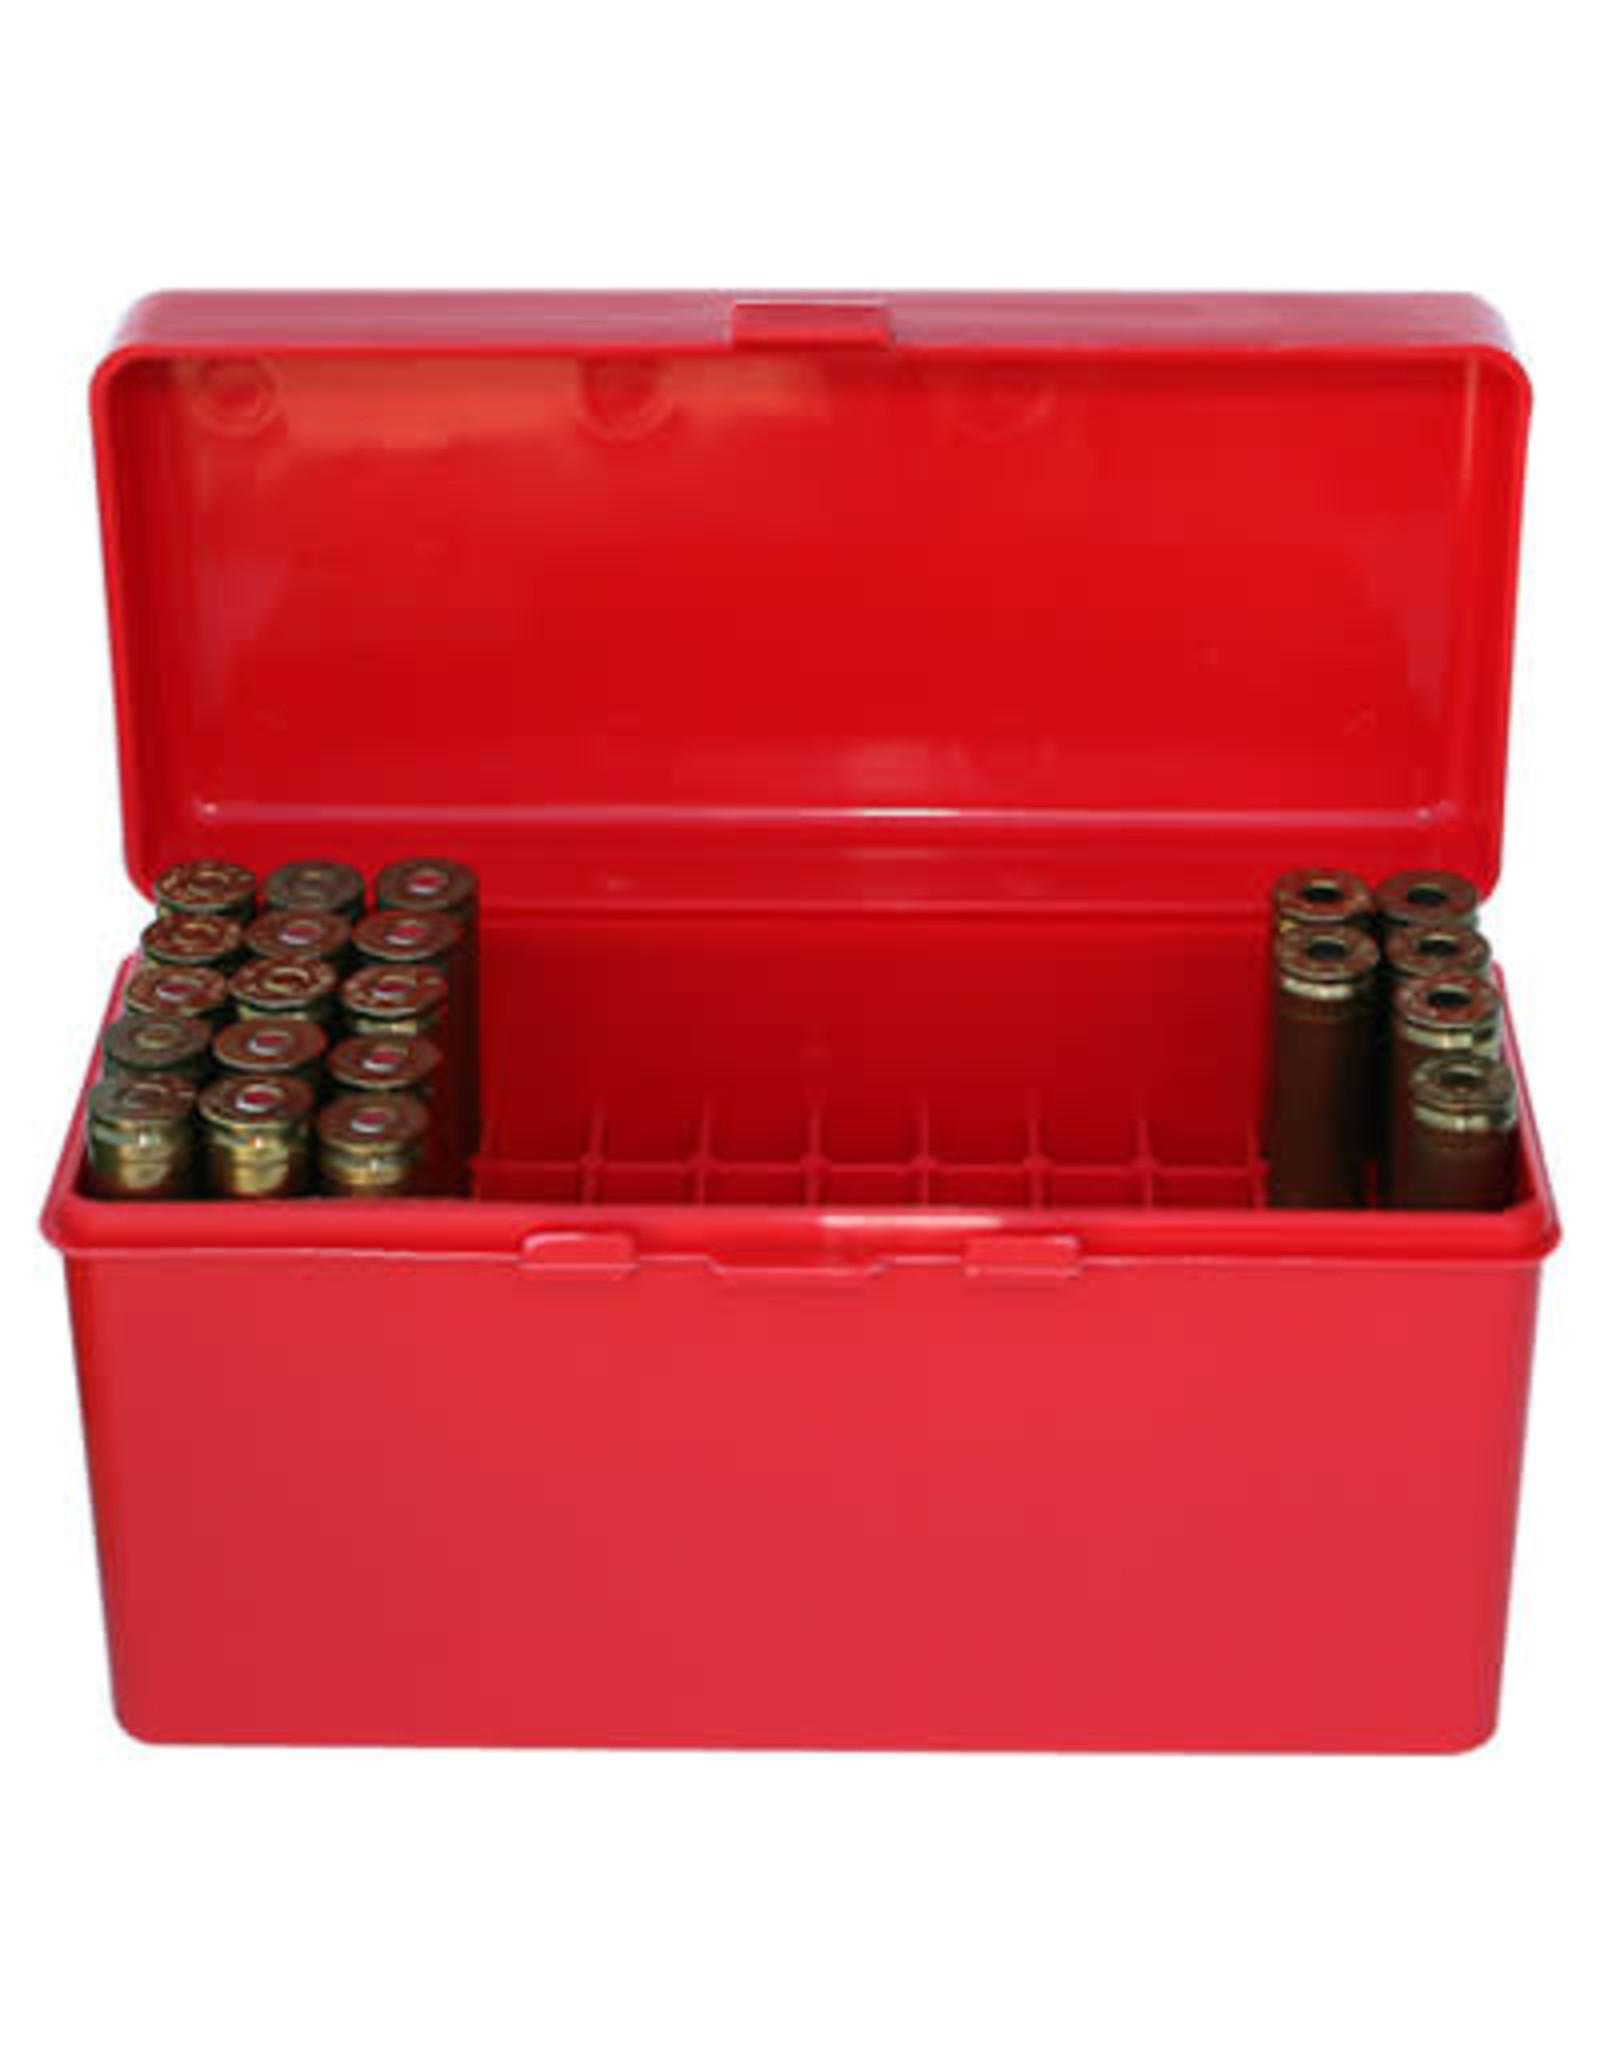 MTM Case-Gard MTM RL-60-10 Case-Gard Ammo Box 60 Round Flip-Top 270 Win 30-06 25-06